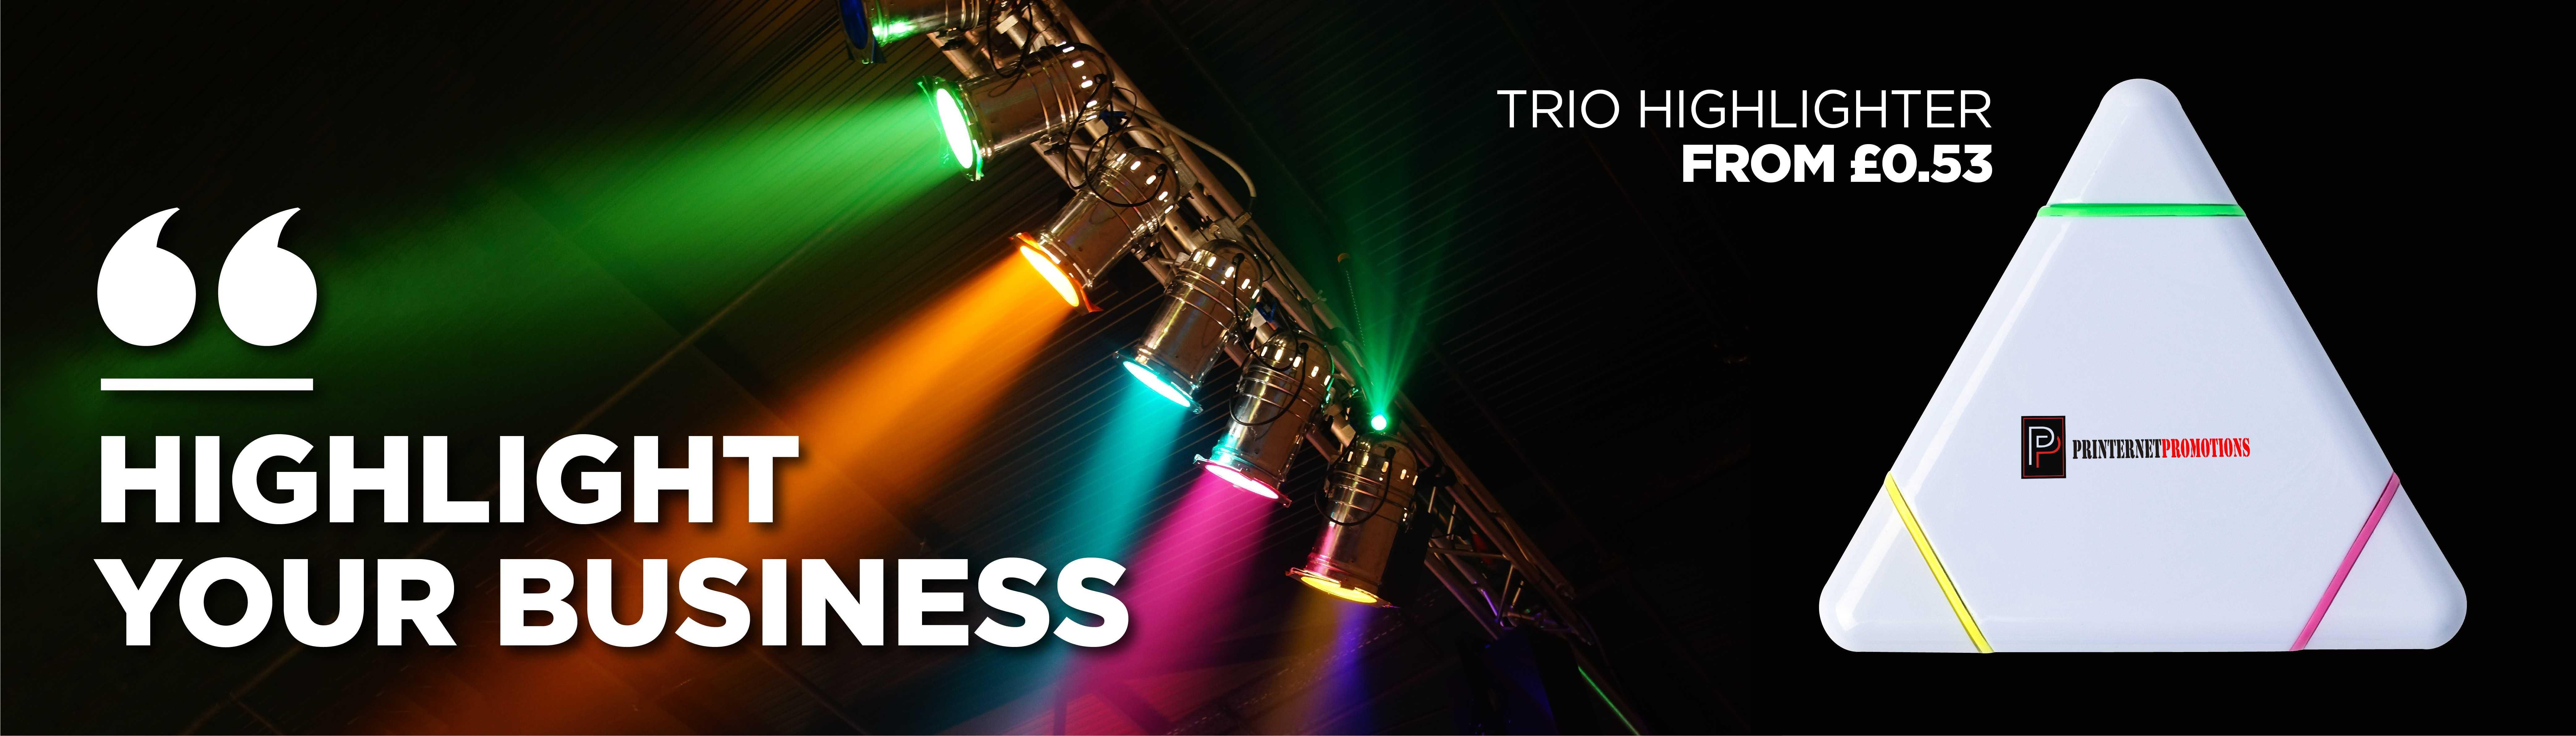 Channl Trio Highlighter Sterling